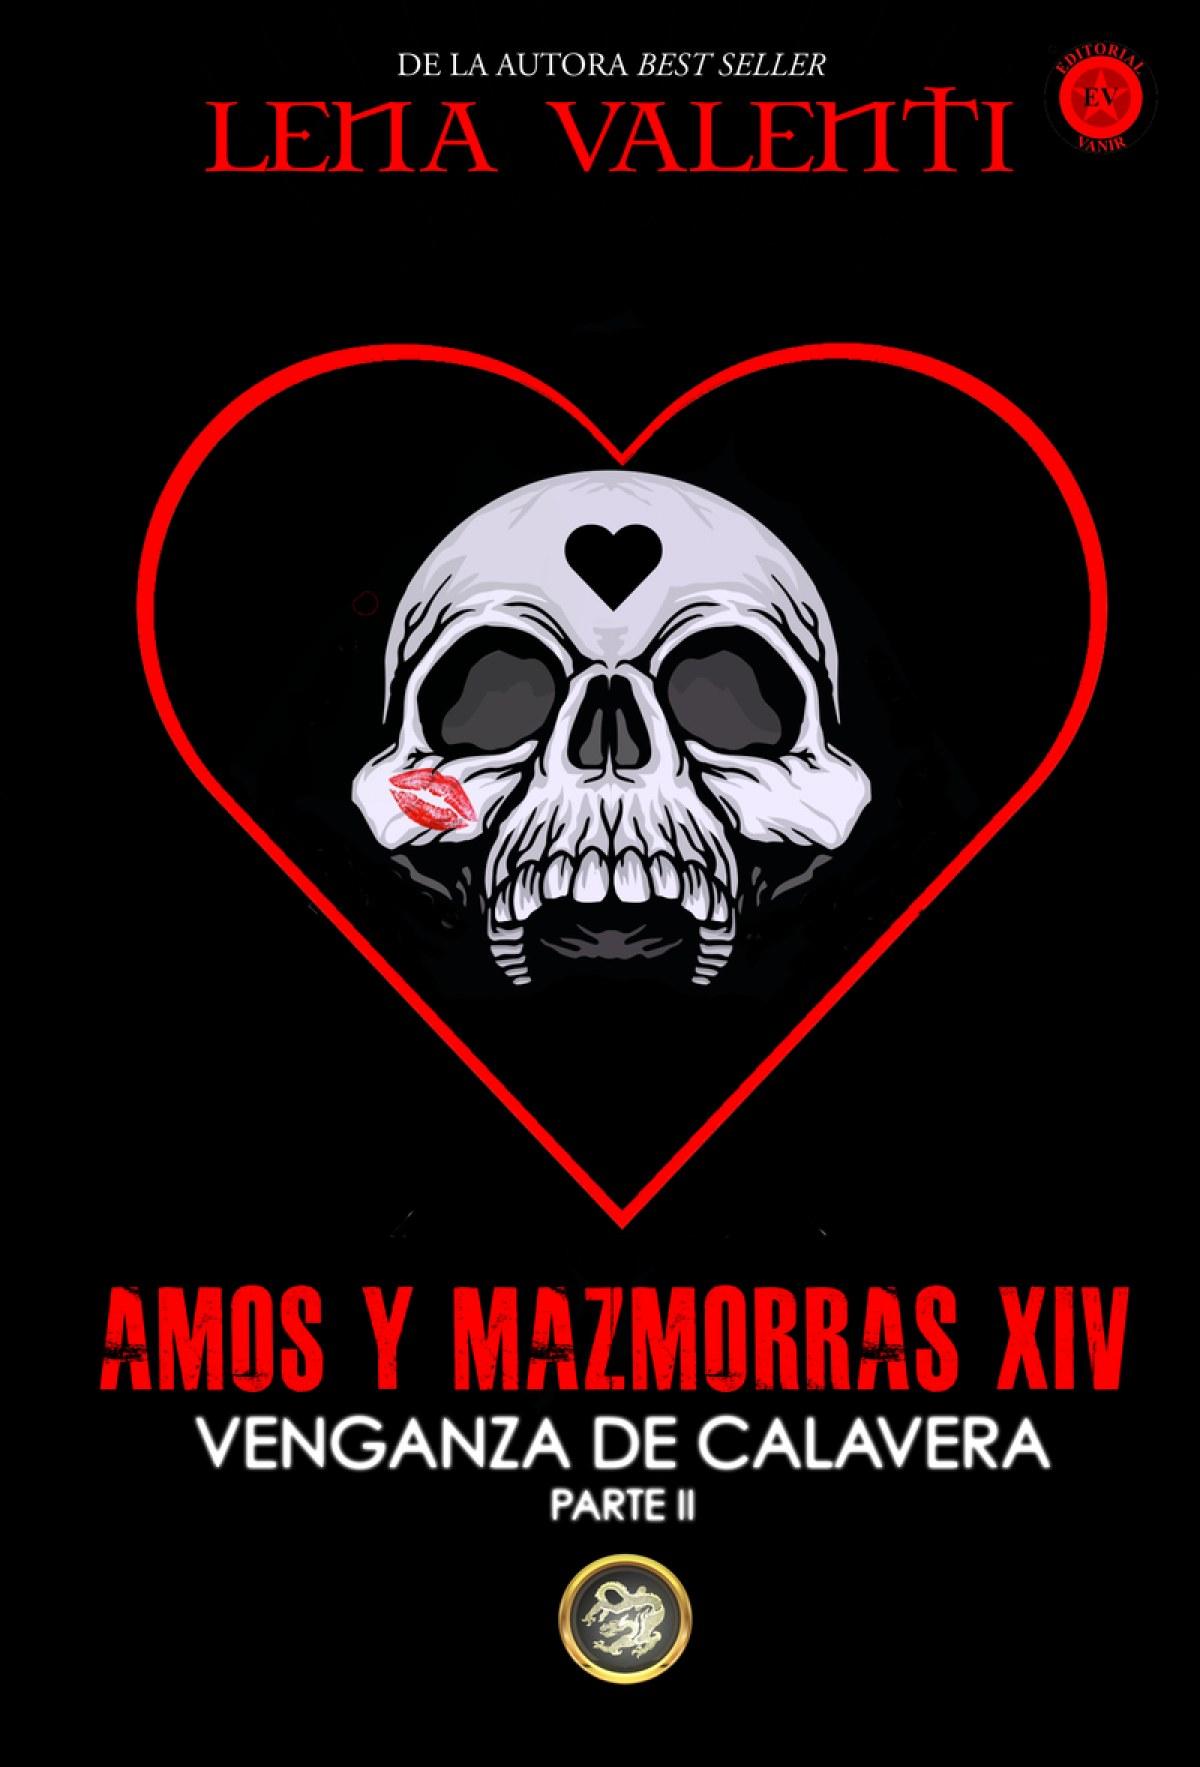 VENGANZA DE CALAVERA 9788494984686